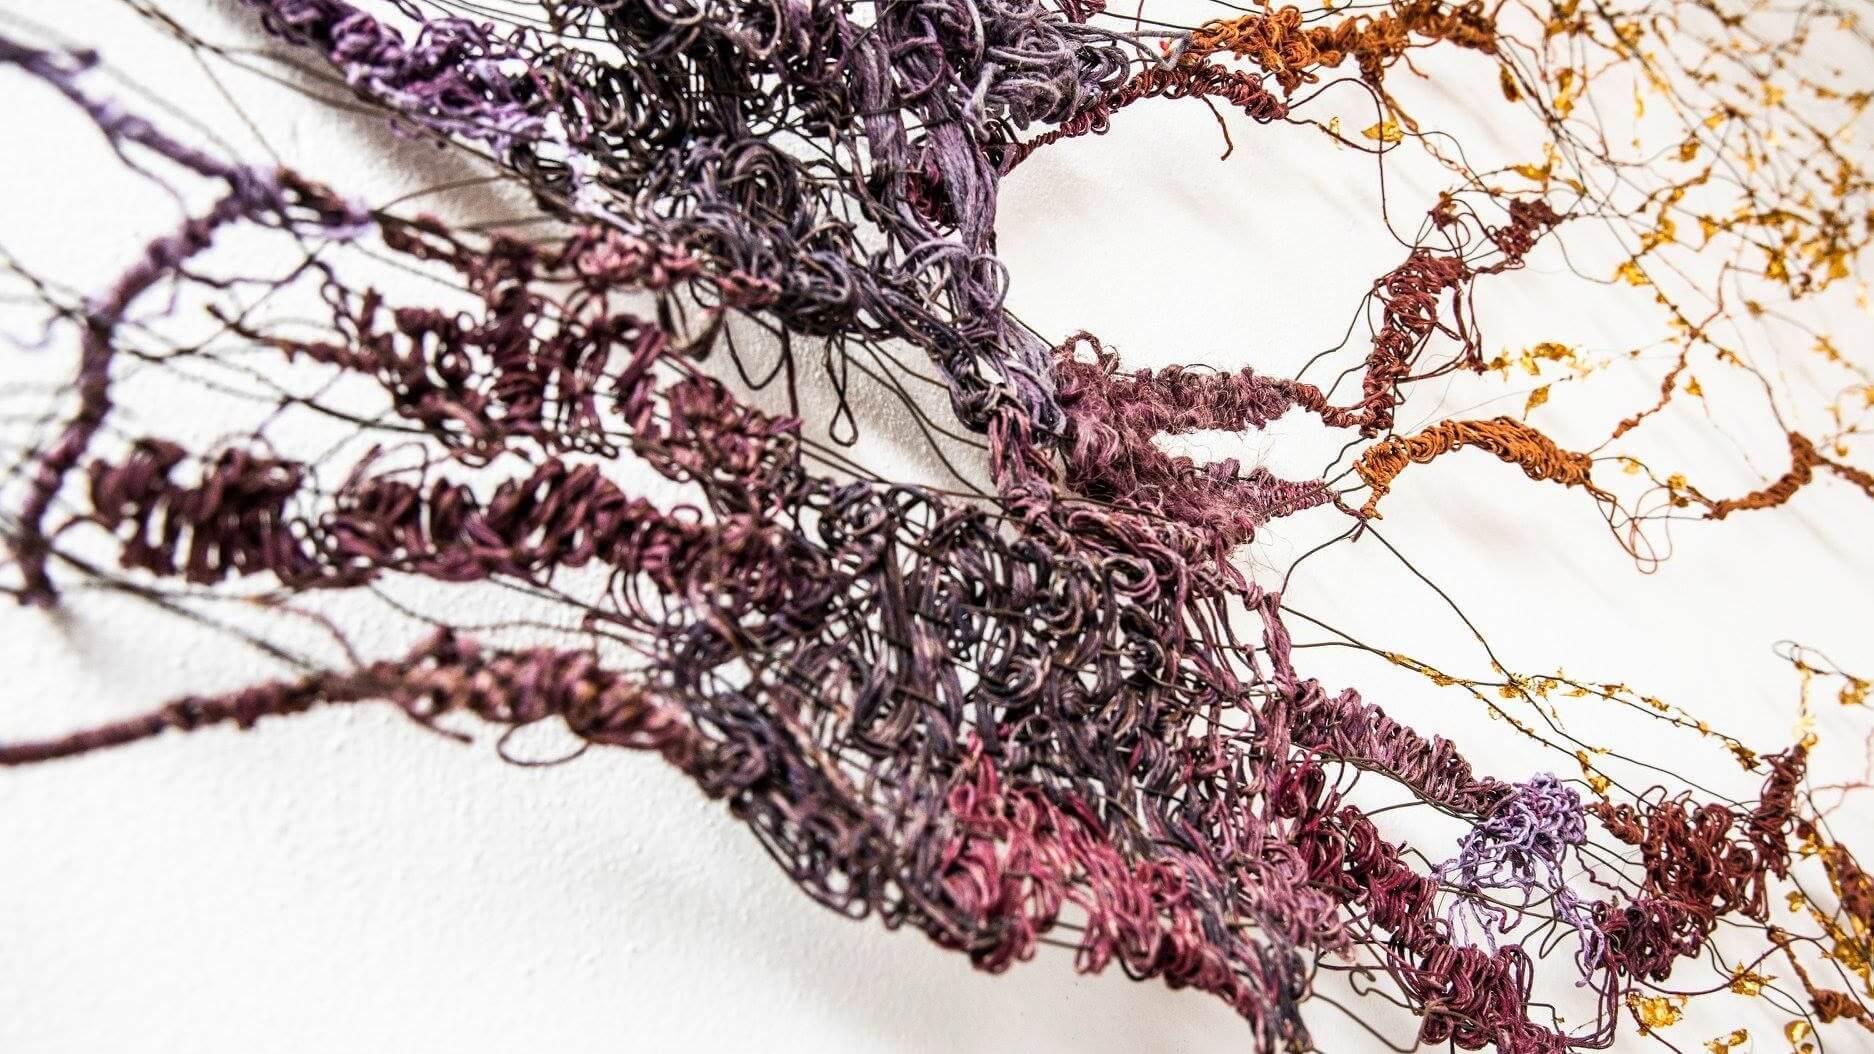 Patrizia-Polese-Textil-Art-Fiber-tapestries-effluvio-details-sl